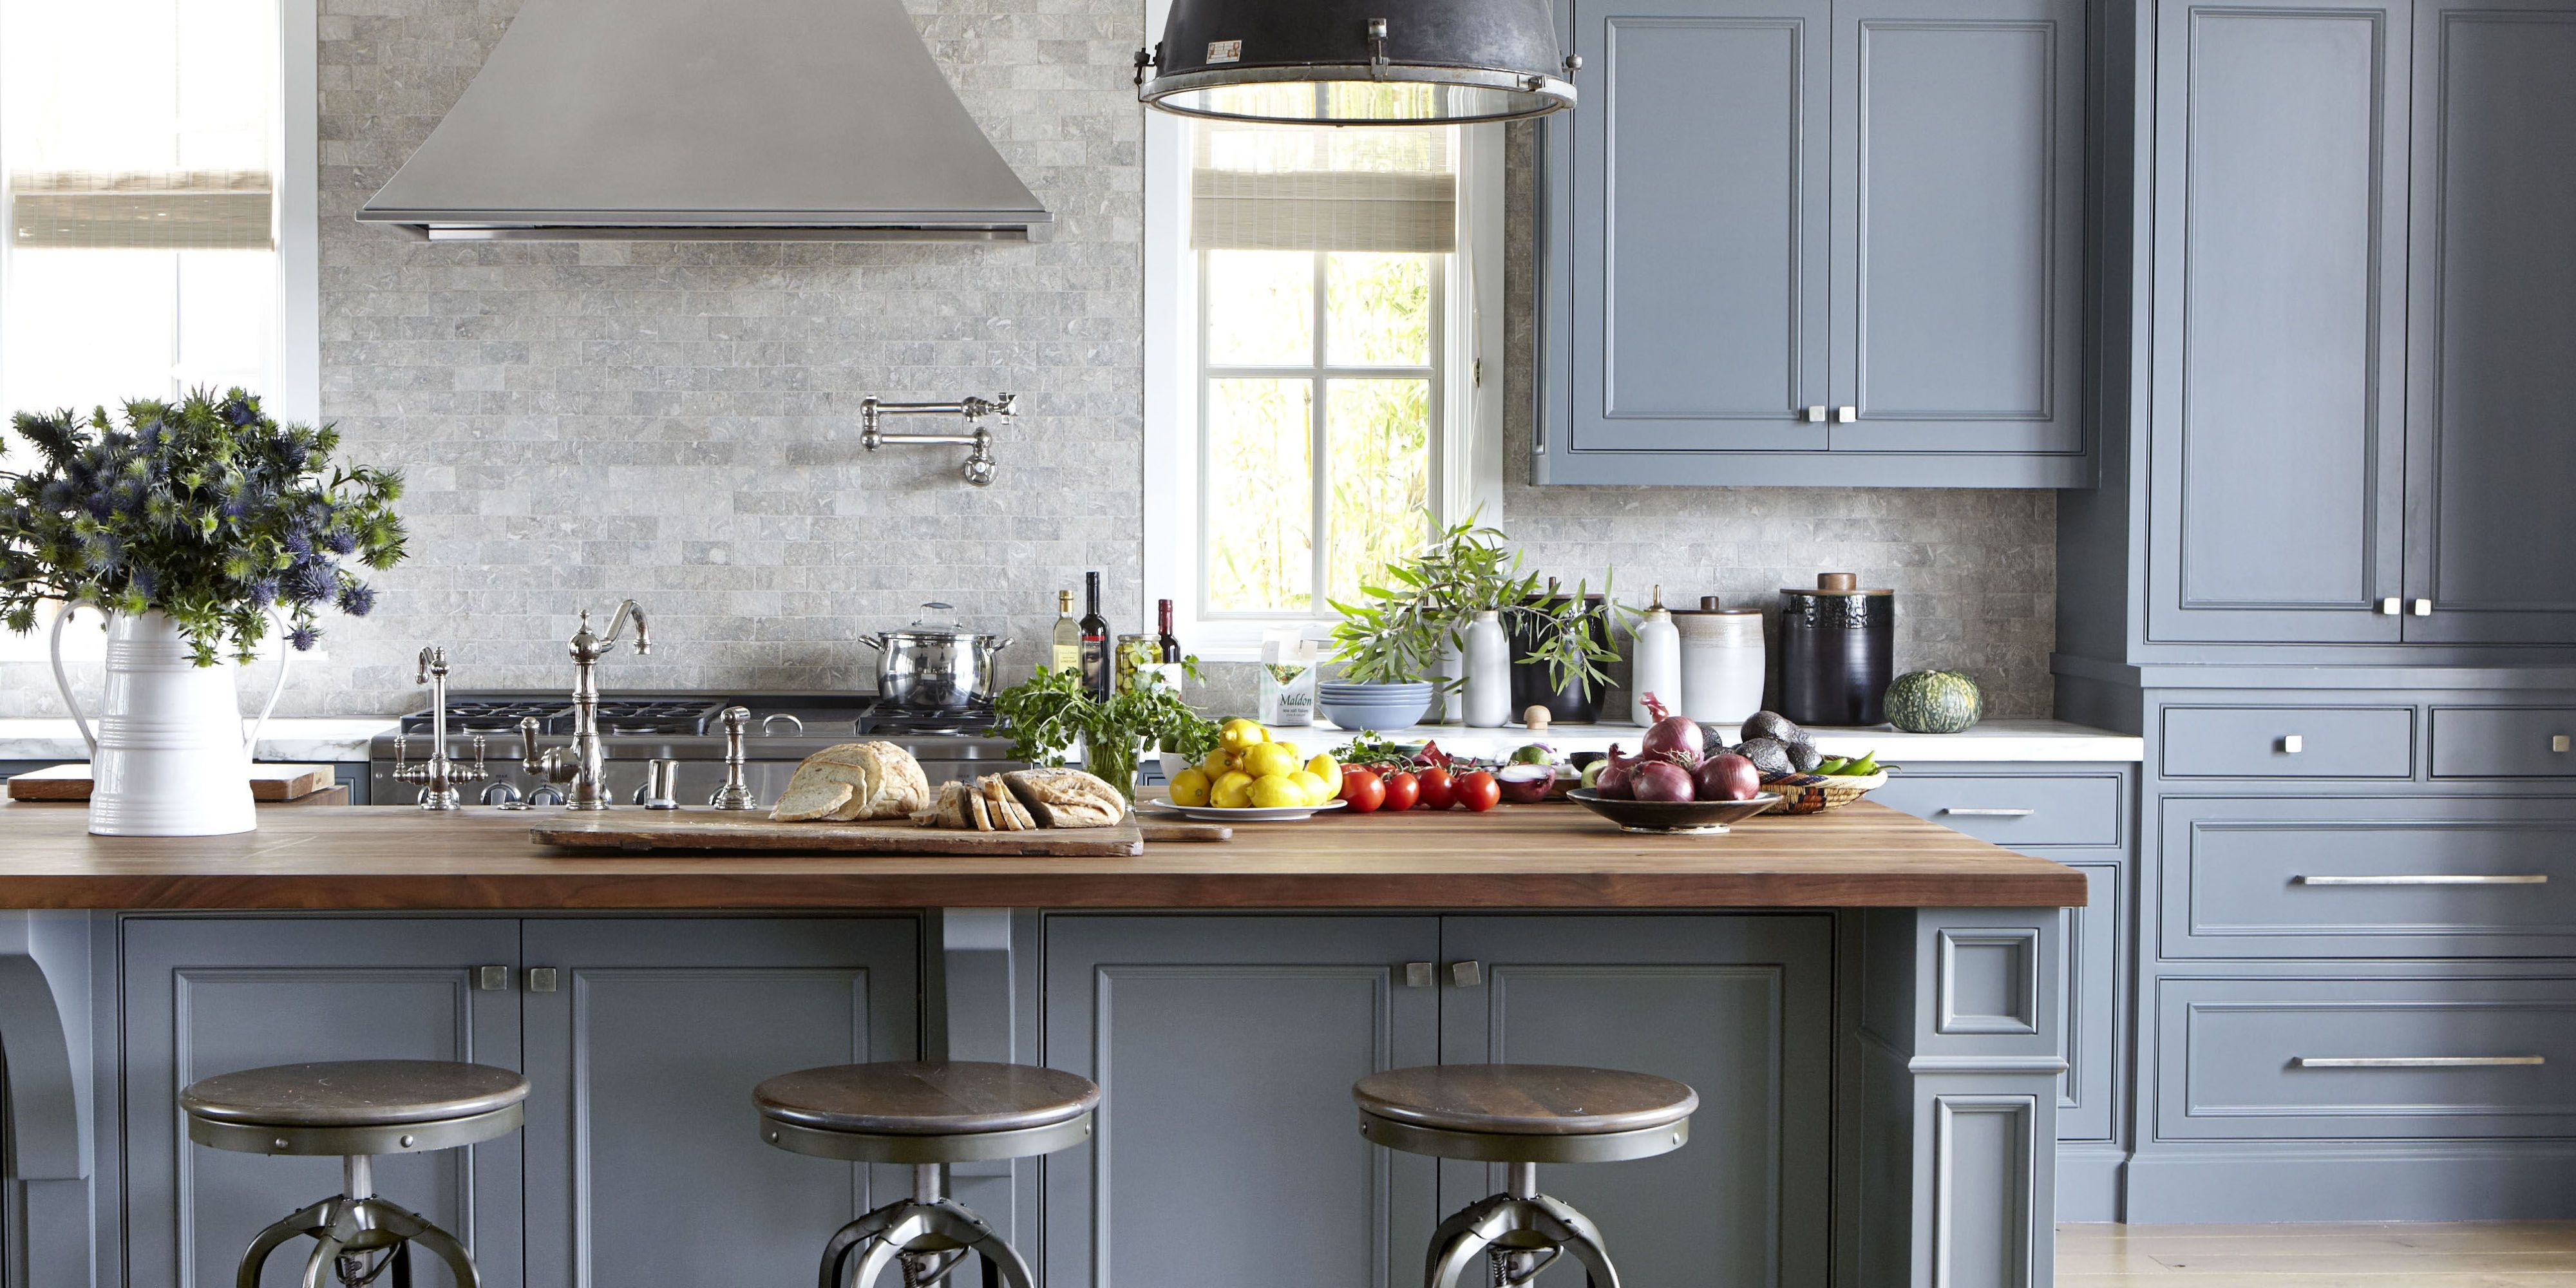 gray kitchen & 14 Best Kitchen Paint Colors - Ideas for Popular Kitchen Colors